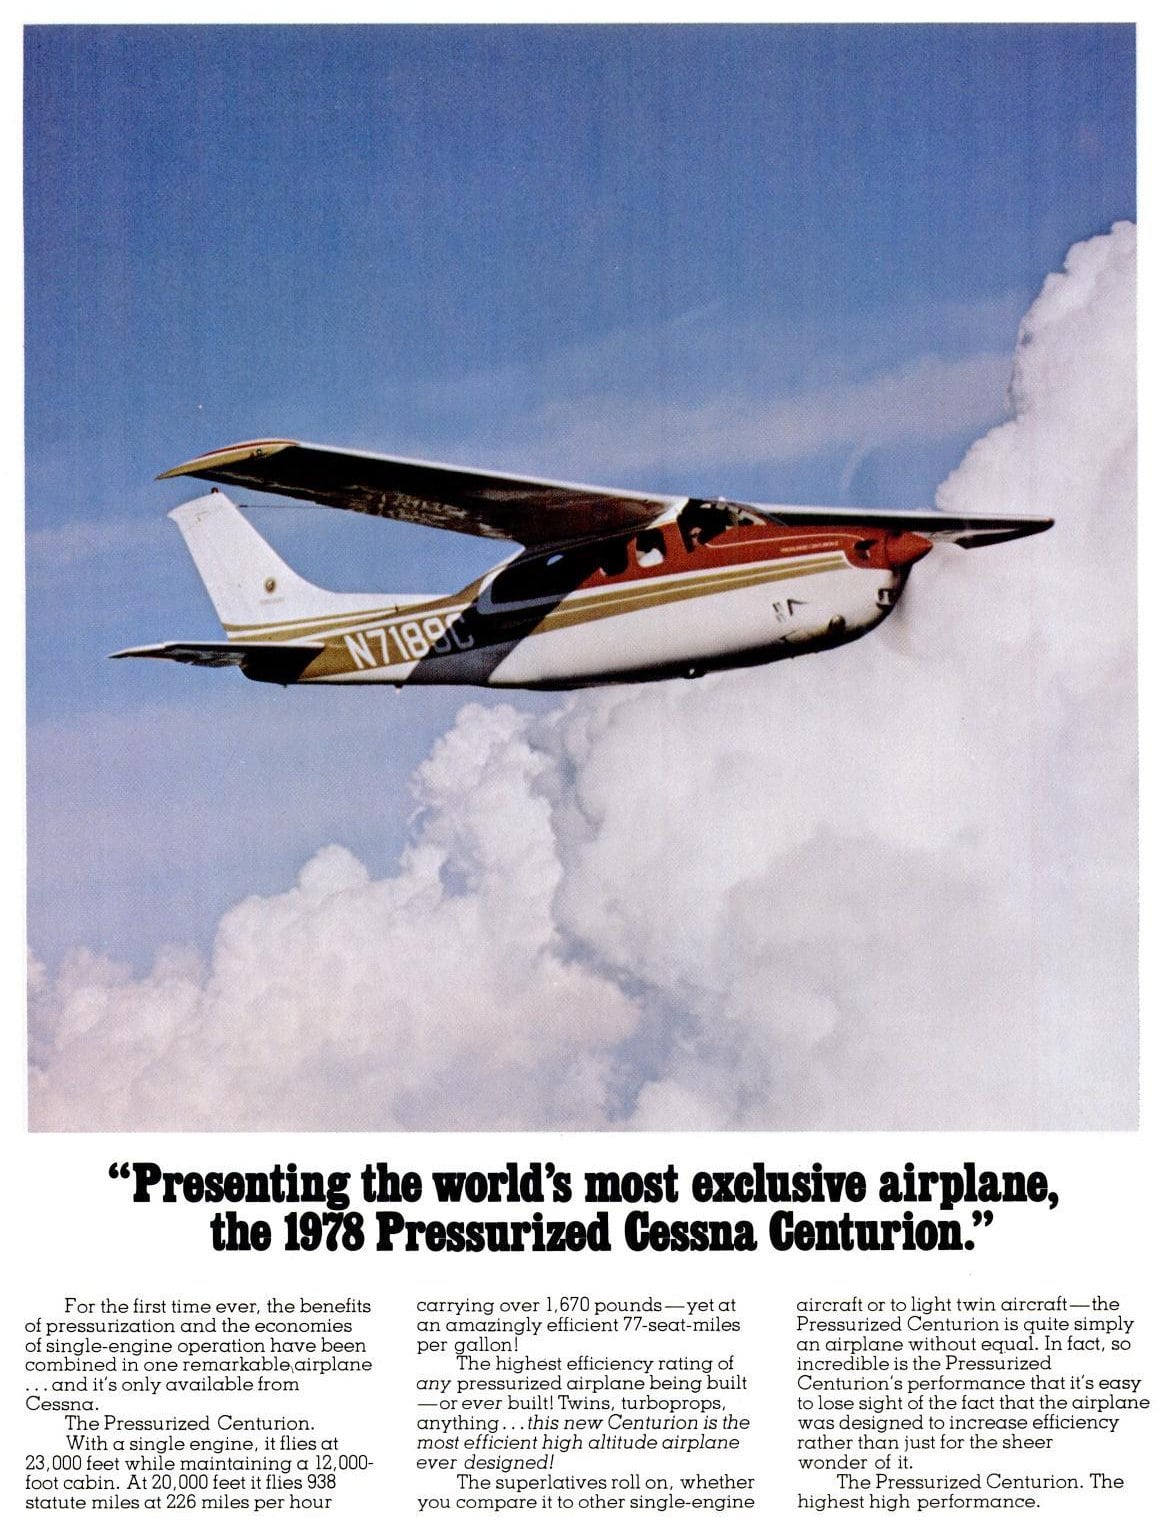 1978 Pressurized Cessna Centurion plane